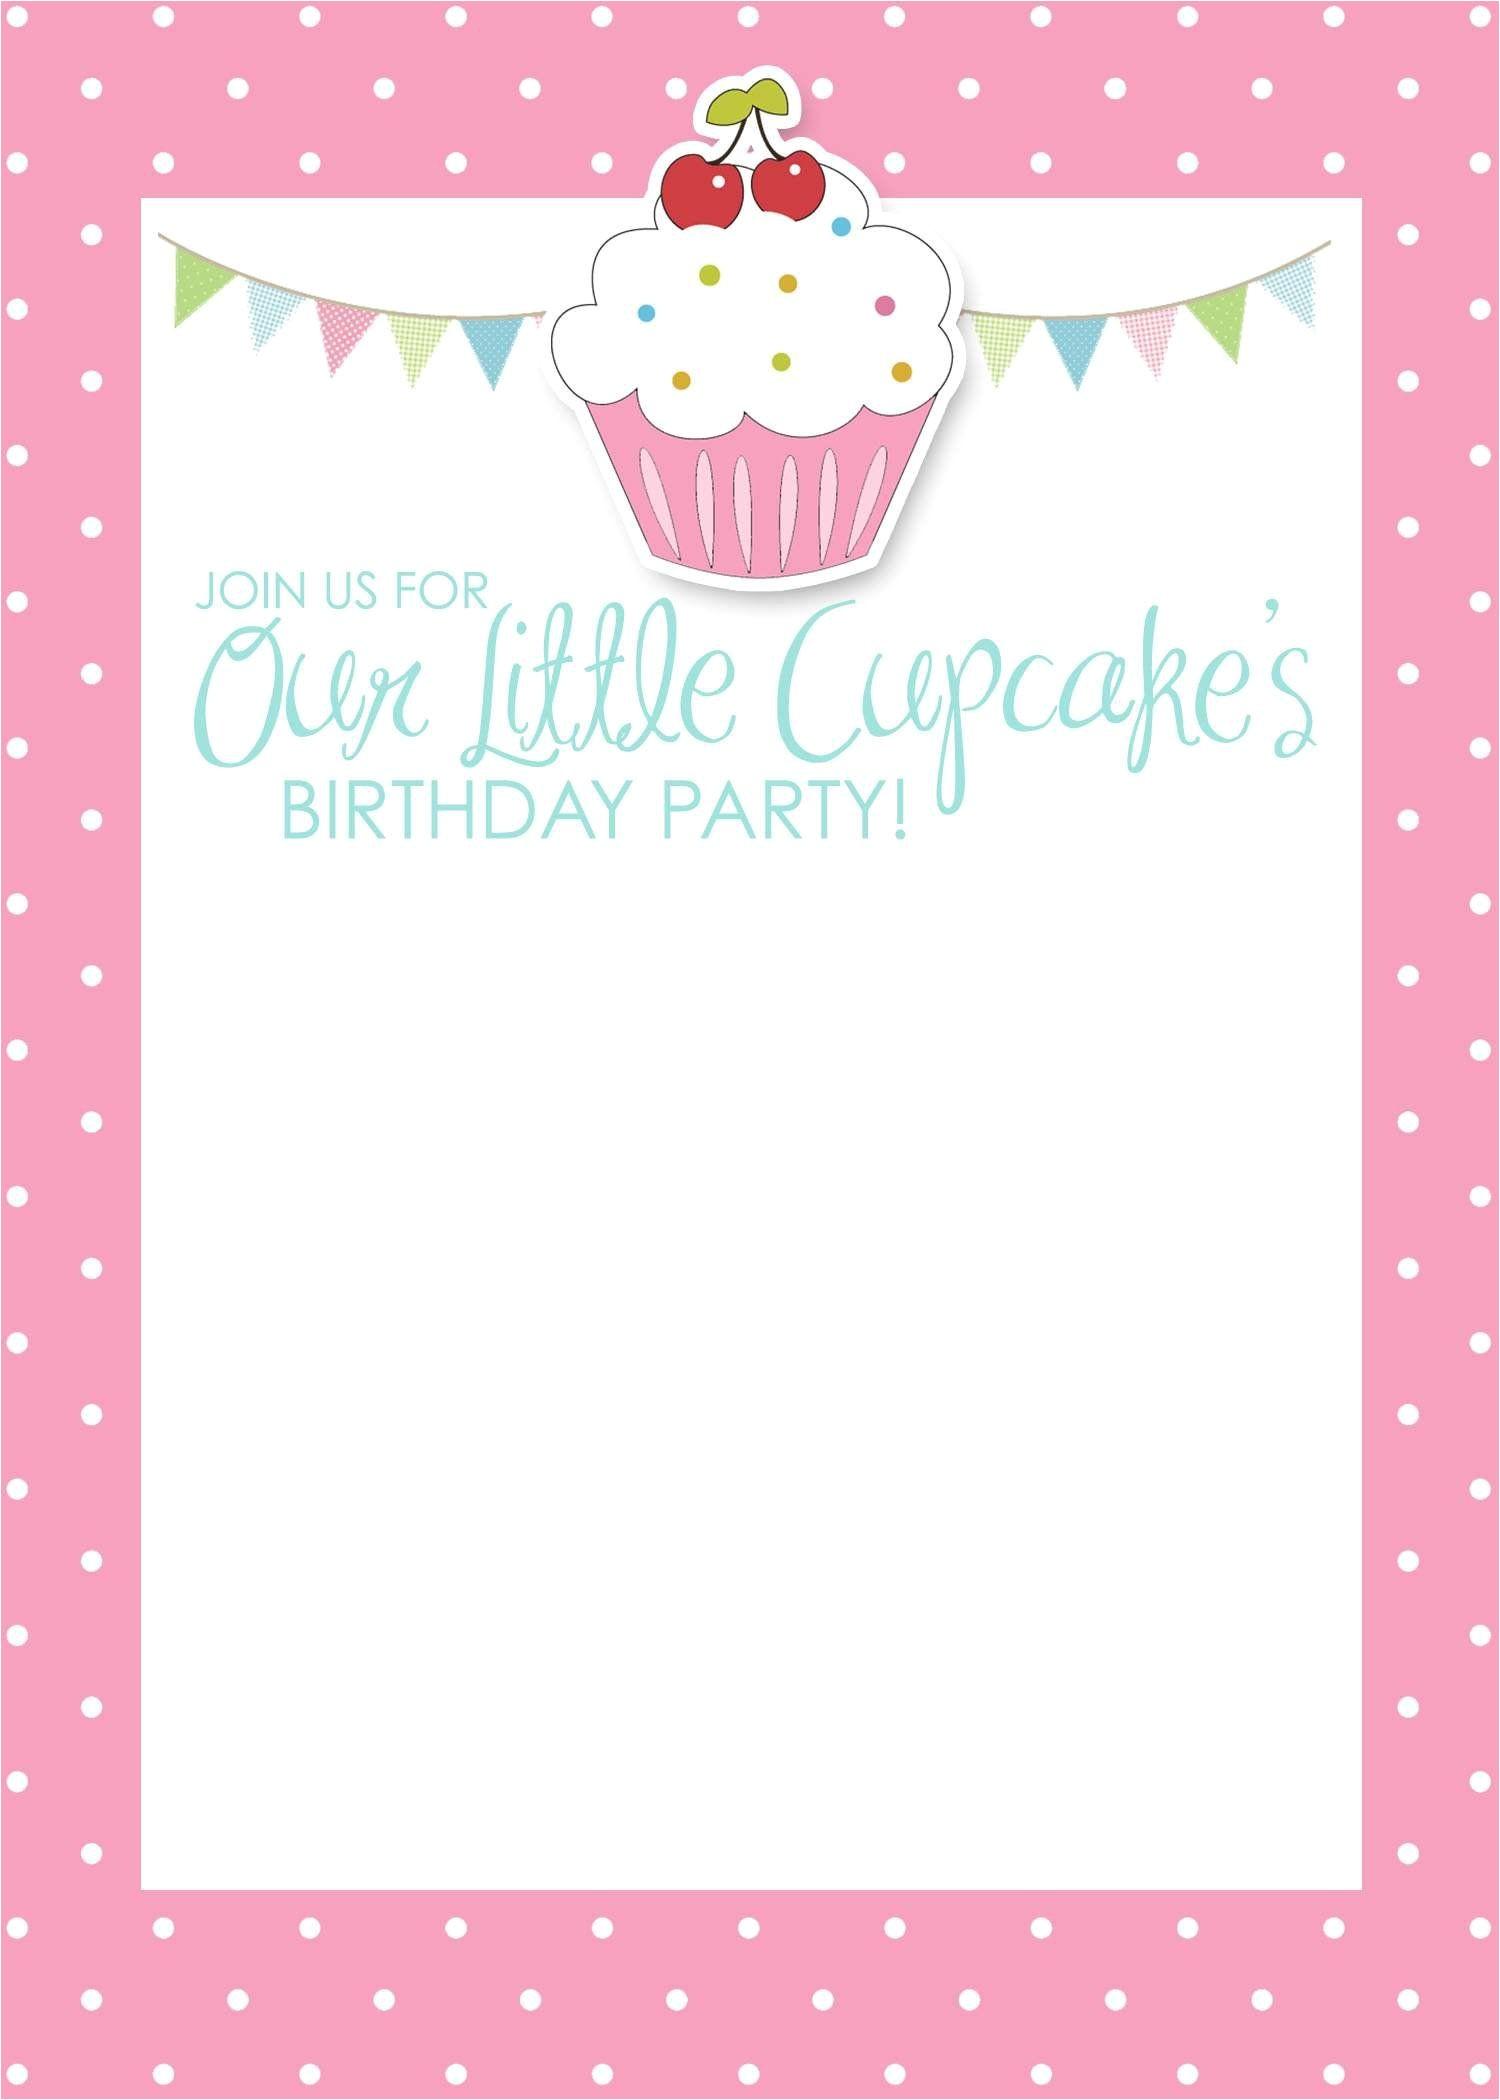 Free Birthday Invitation Templates with Photo Birthday Invitation Card Template Free